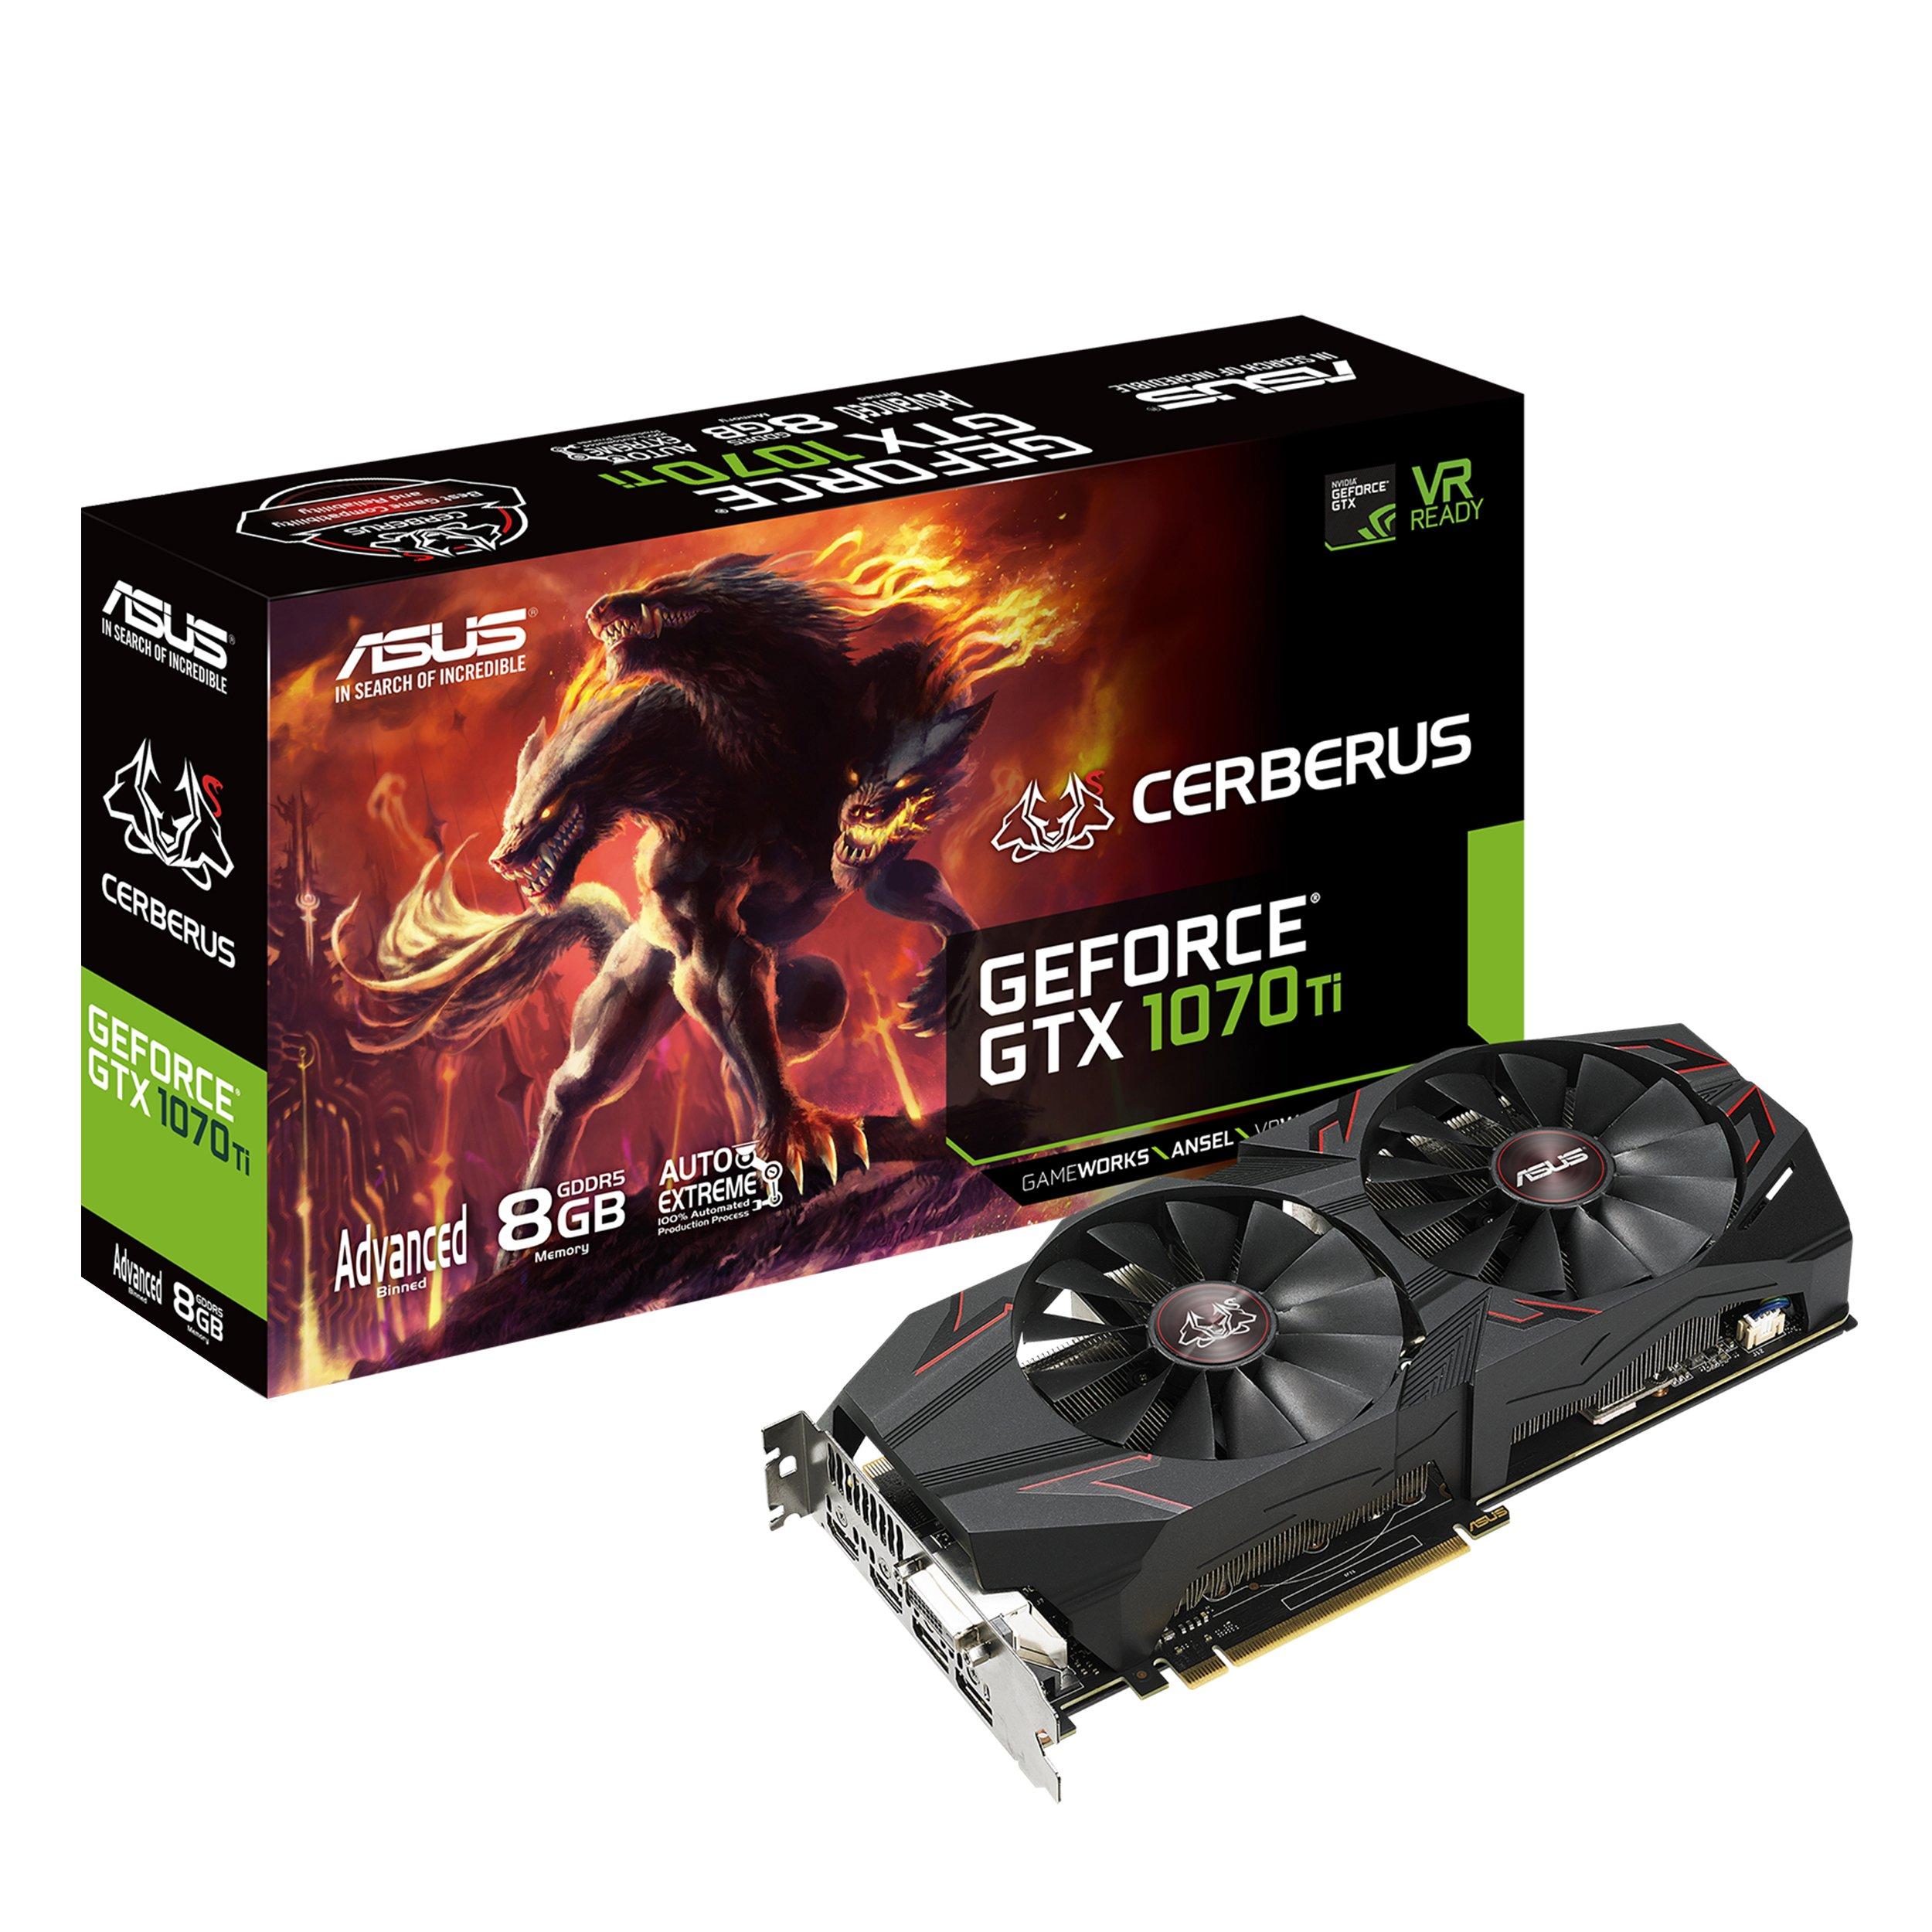 ASUS Cerberus GeForce GTX 1070 Ti 8GB GDDR5 Advanced Edition VR Ready DP HDMI DVI Gaming Graphics Card (CERBERUS-GTX1070TI-A8G-GAMING)